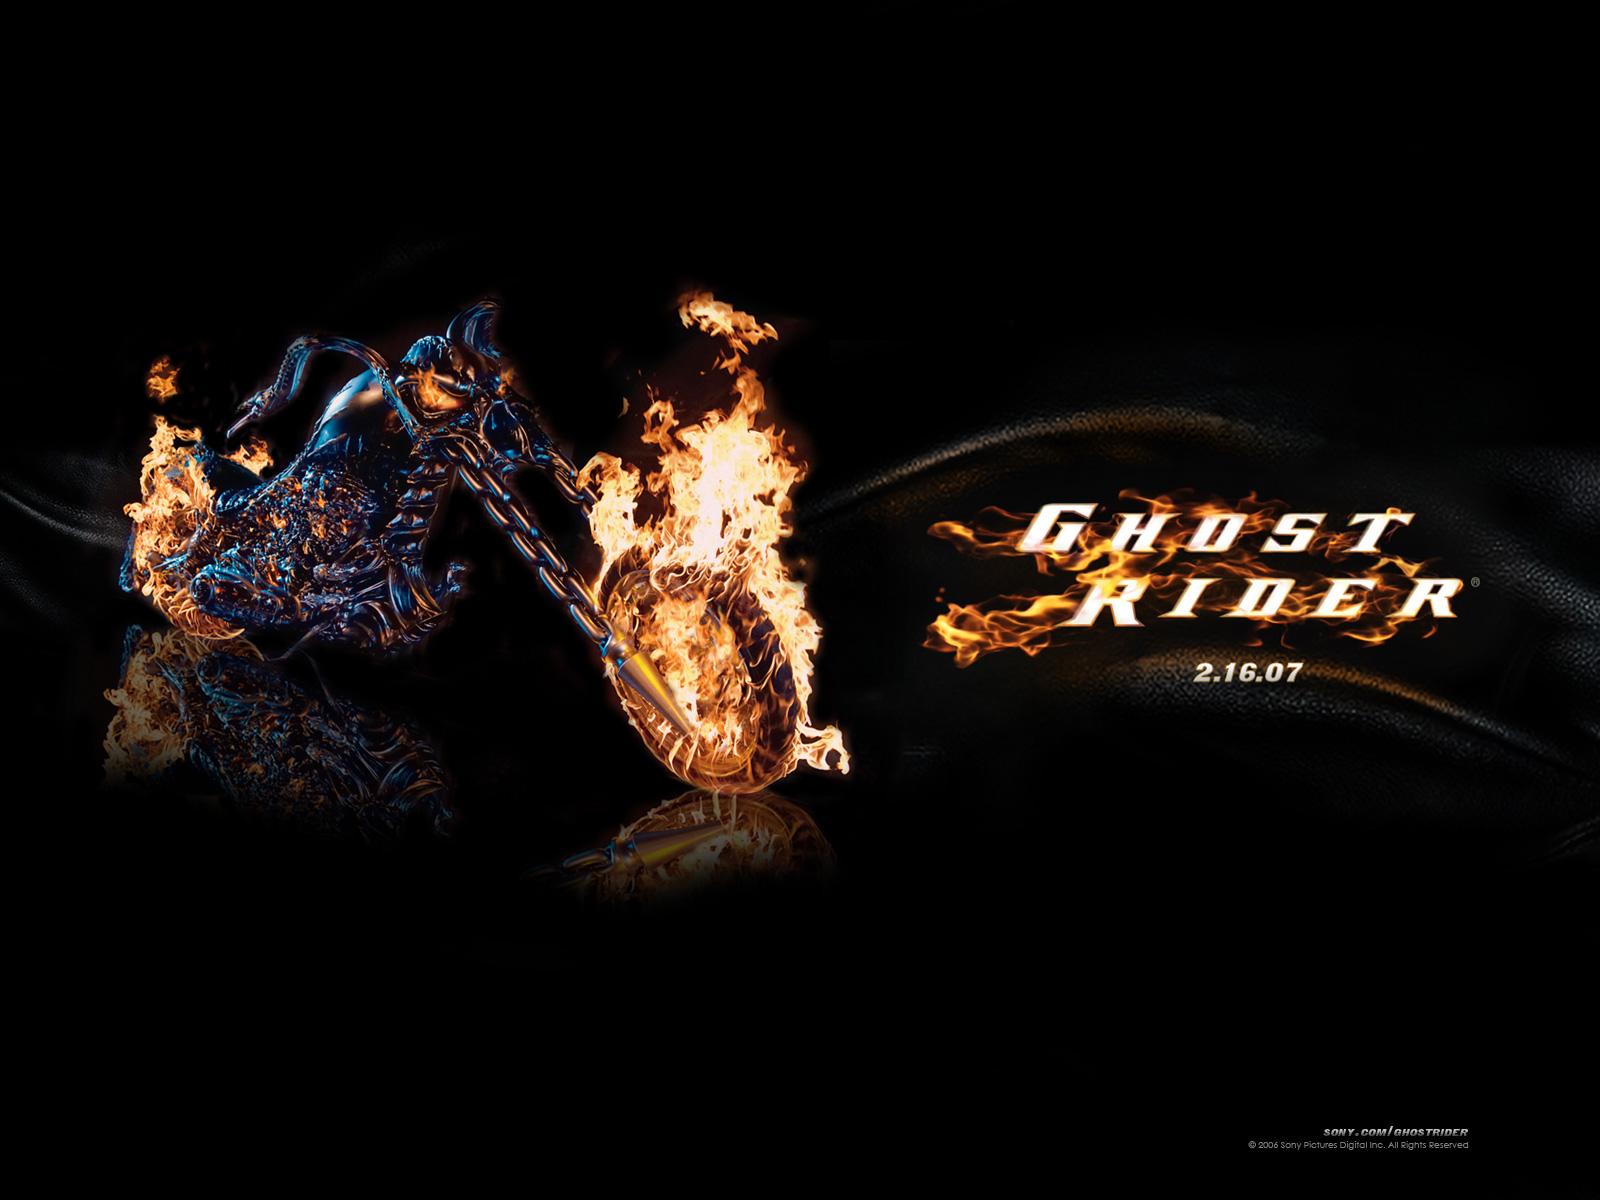 http://4.bp.blogspot.com/-wdhnHR7tI-U/TWUbgvzAmJI/AAAAAAAAALQ/xyD5UGK3beo/s1600/ghost-rider_0008.jpg